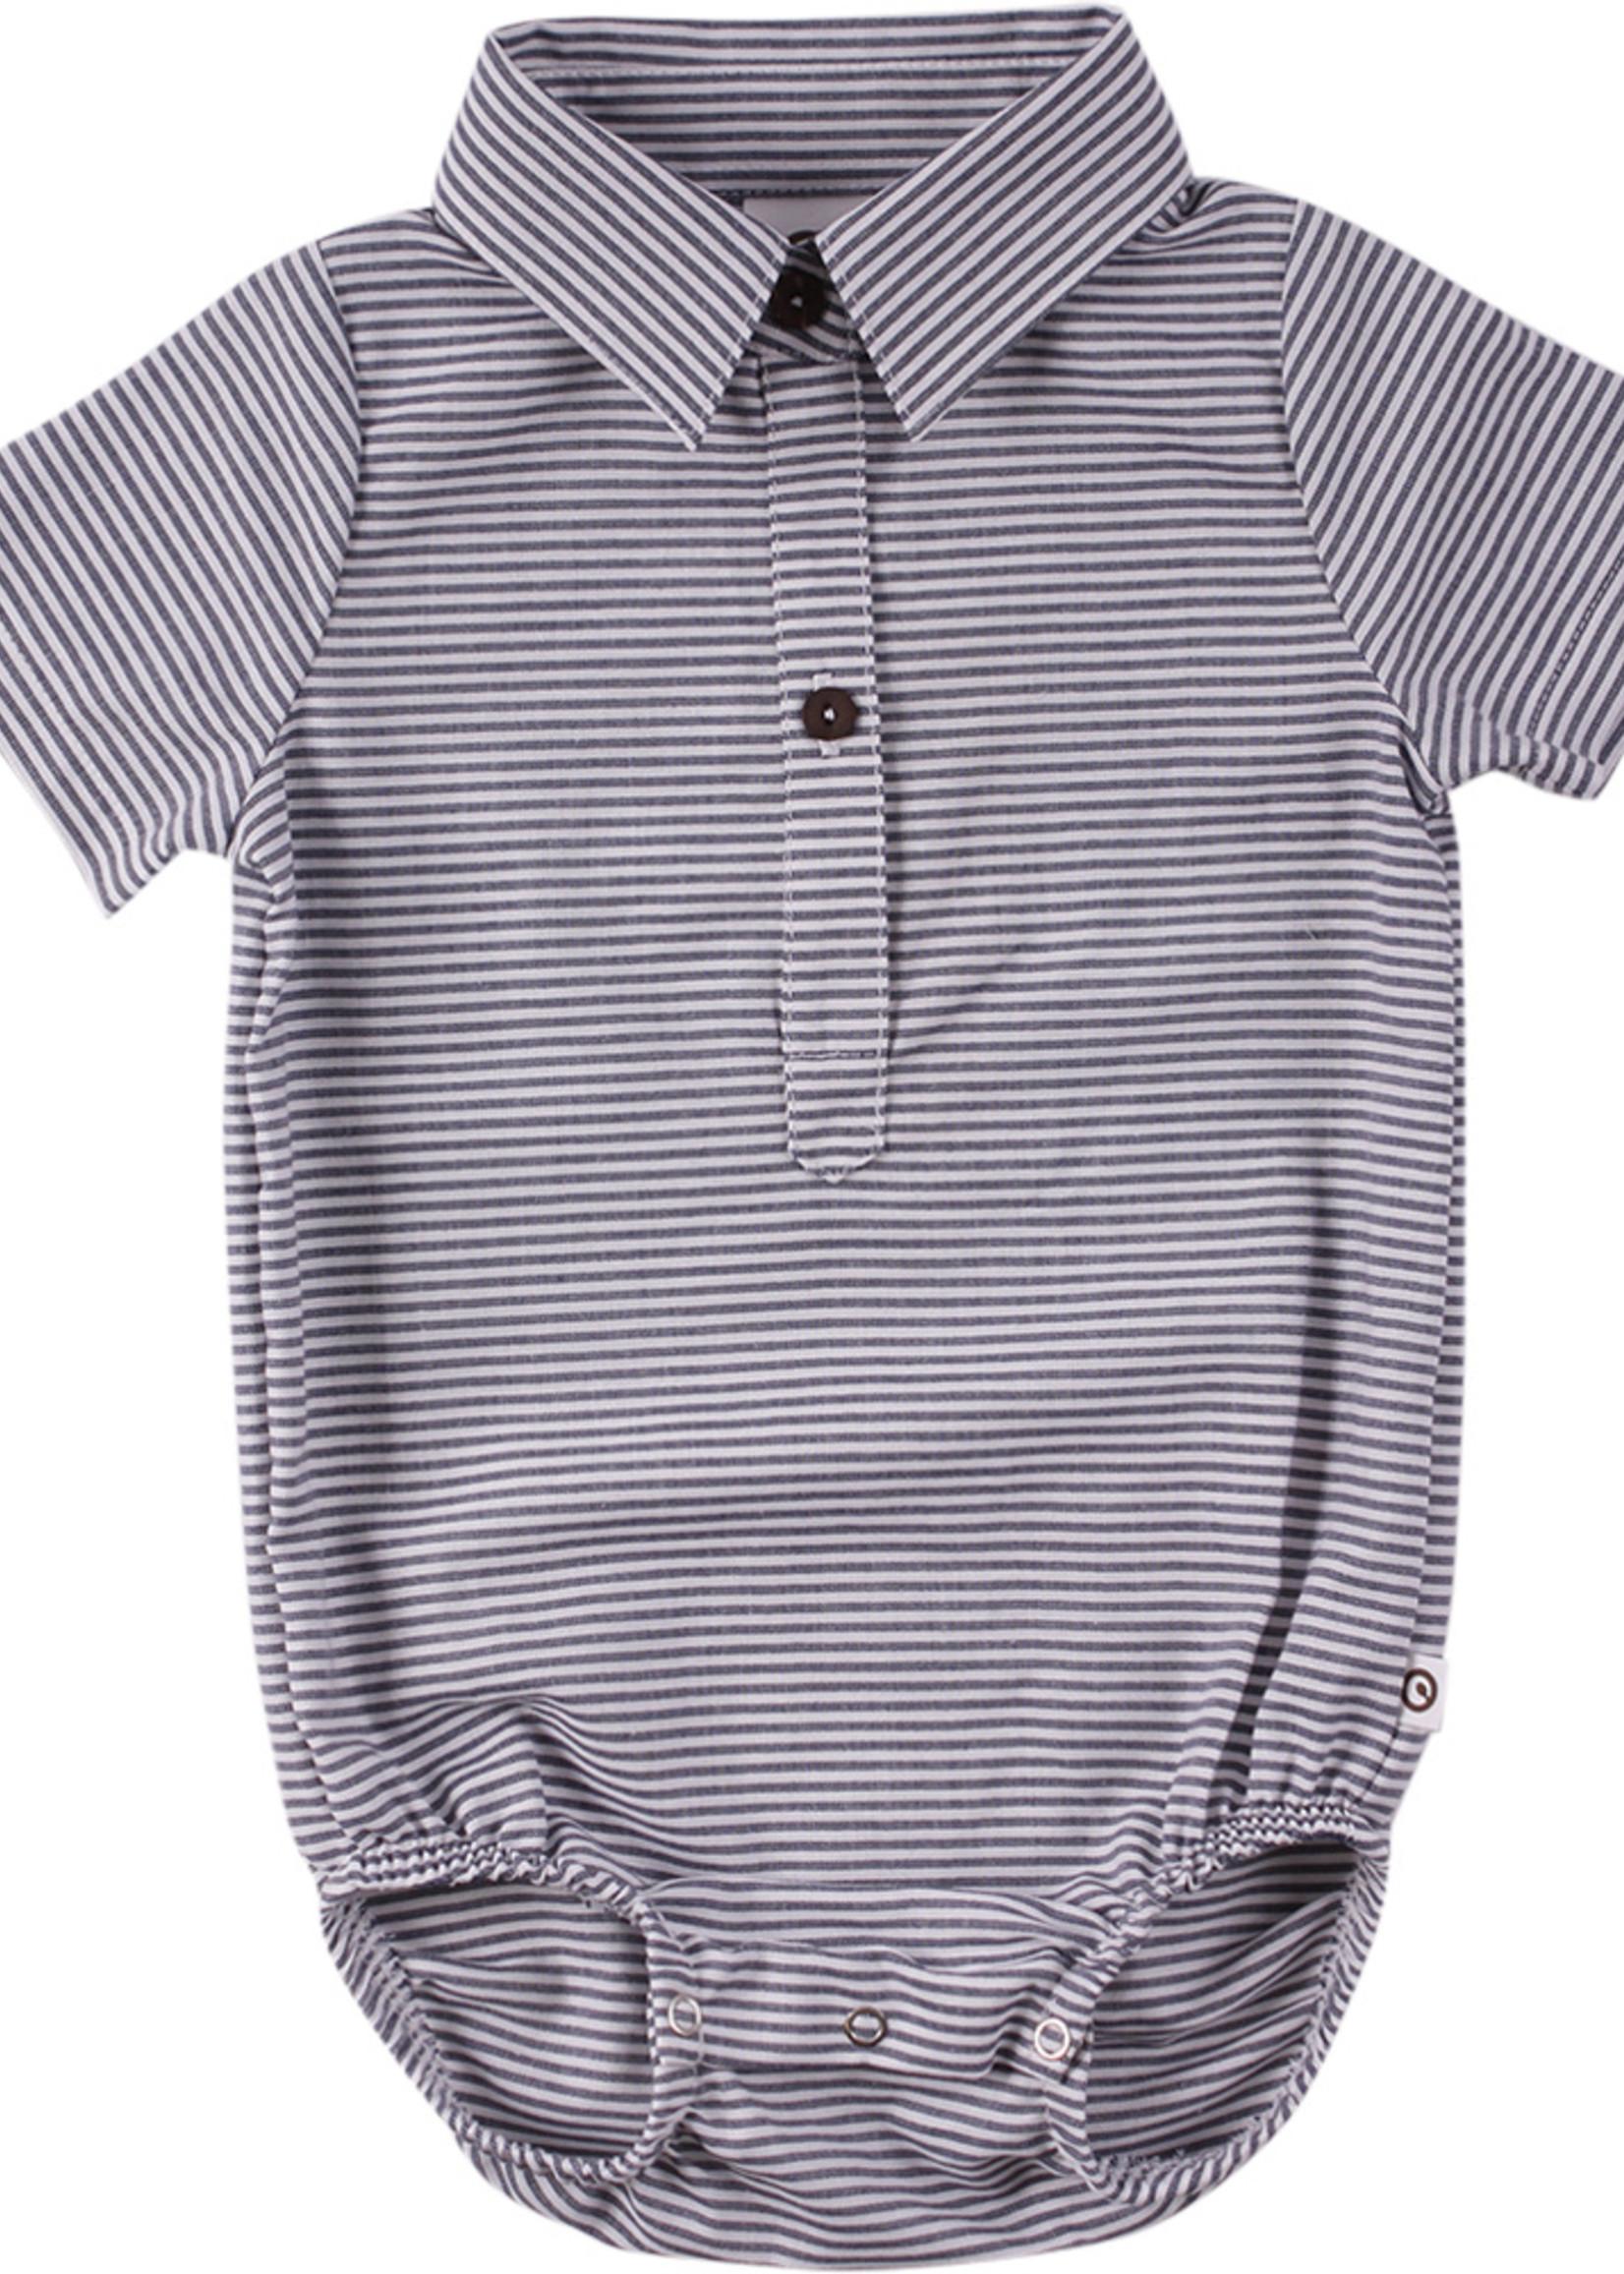 Müsli Müsli - Woven stripe s/s body - White/blue stripe